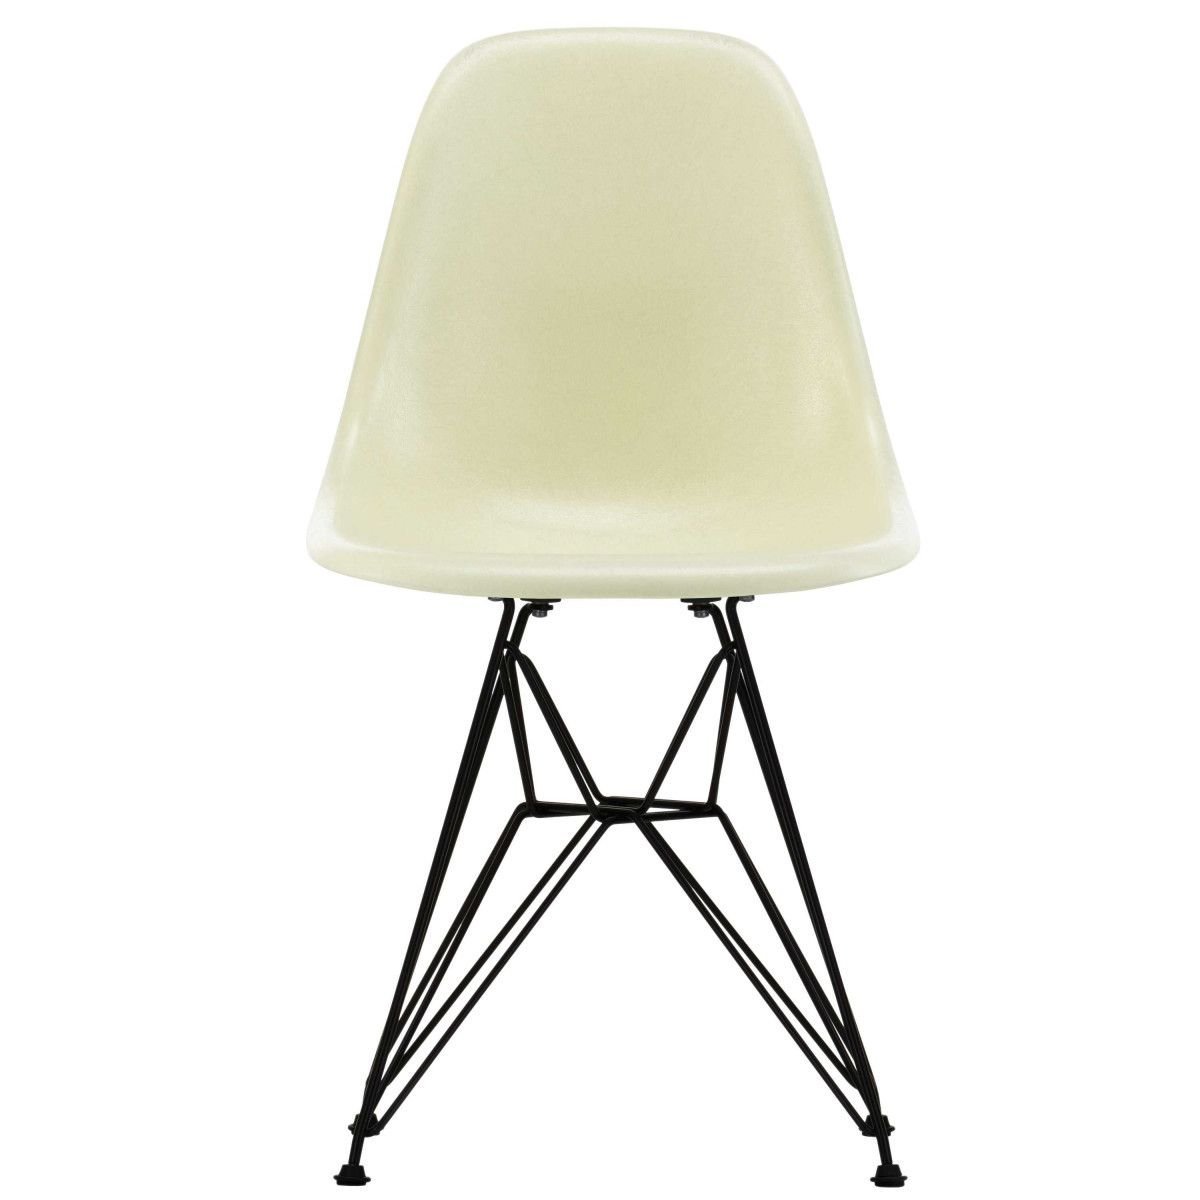 Vitra Eames Fiberglass Chair DSR - Parchment/Basic Dark